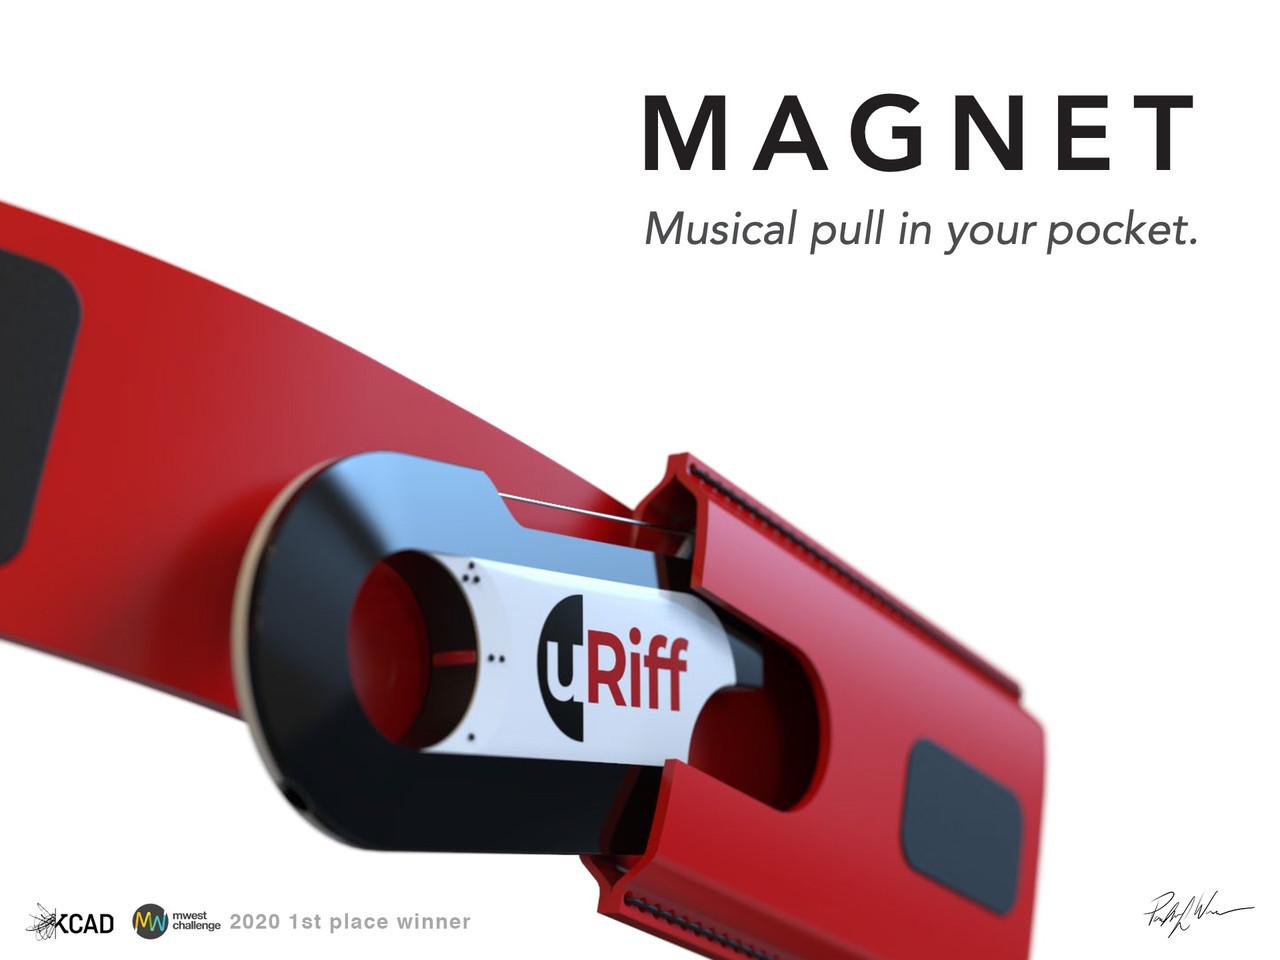 uRiff Magnet 1st place winner